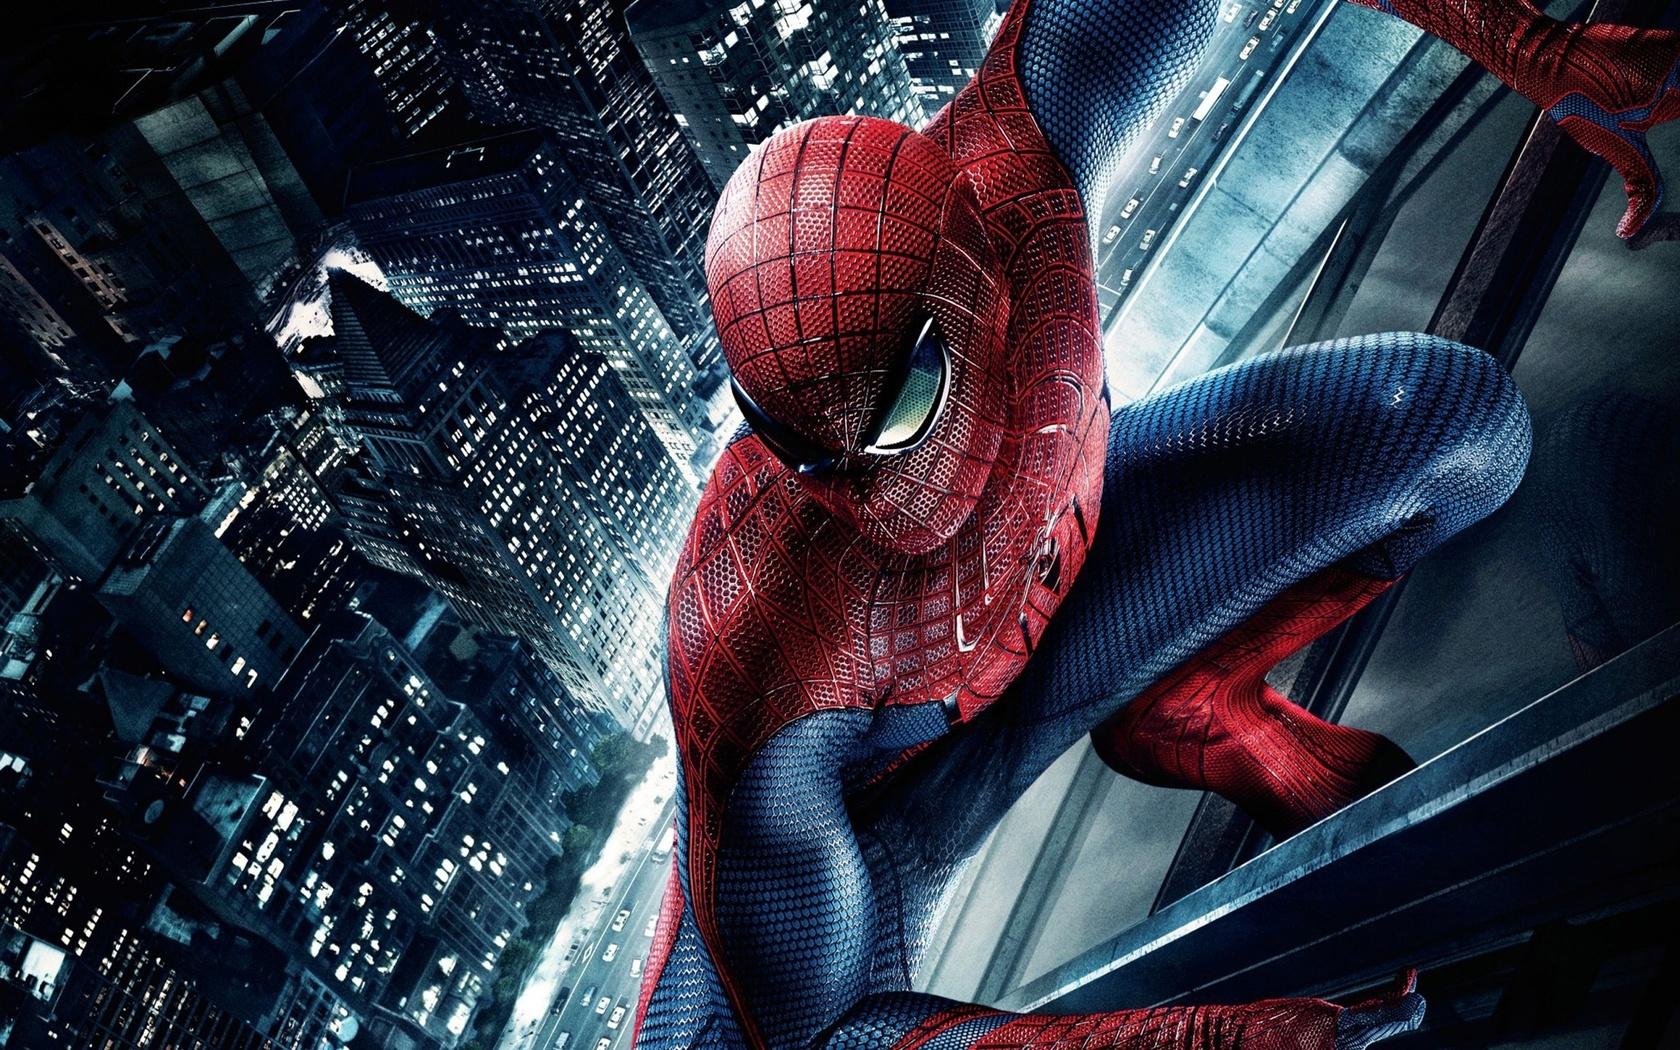 Amazing Spiderman spiderman pictures